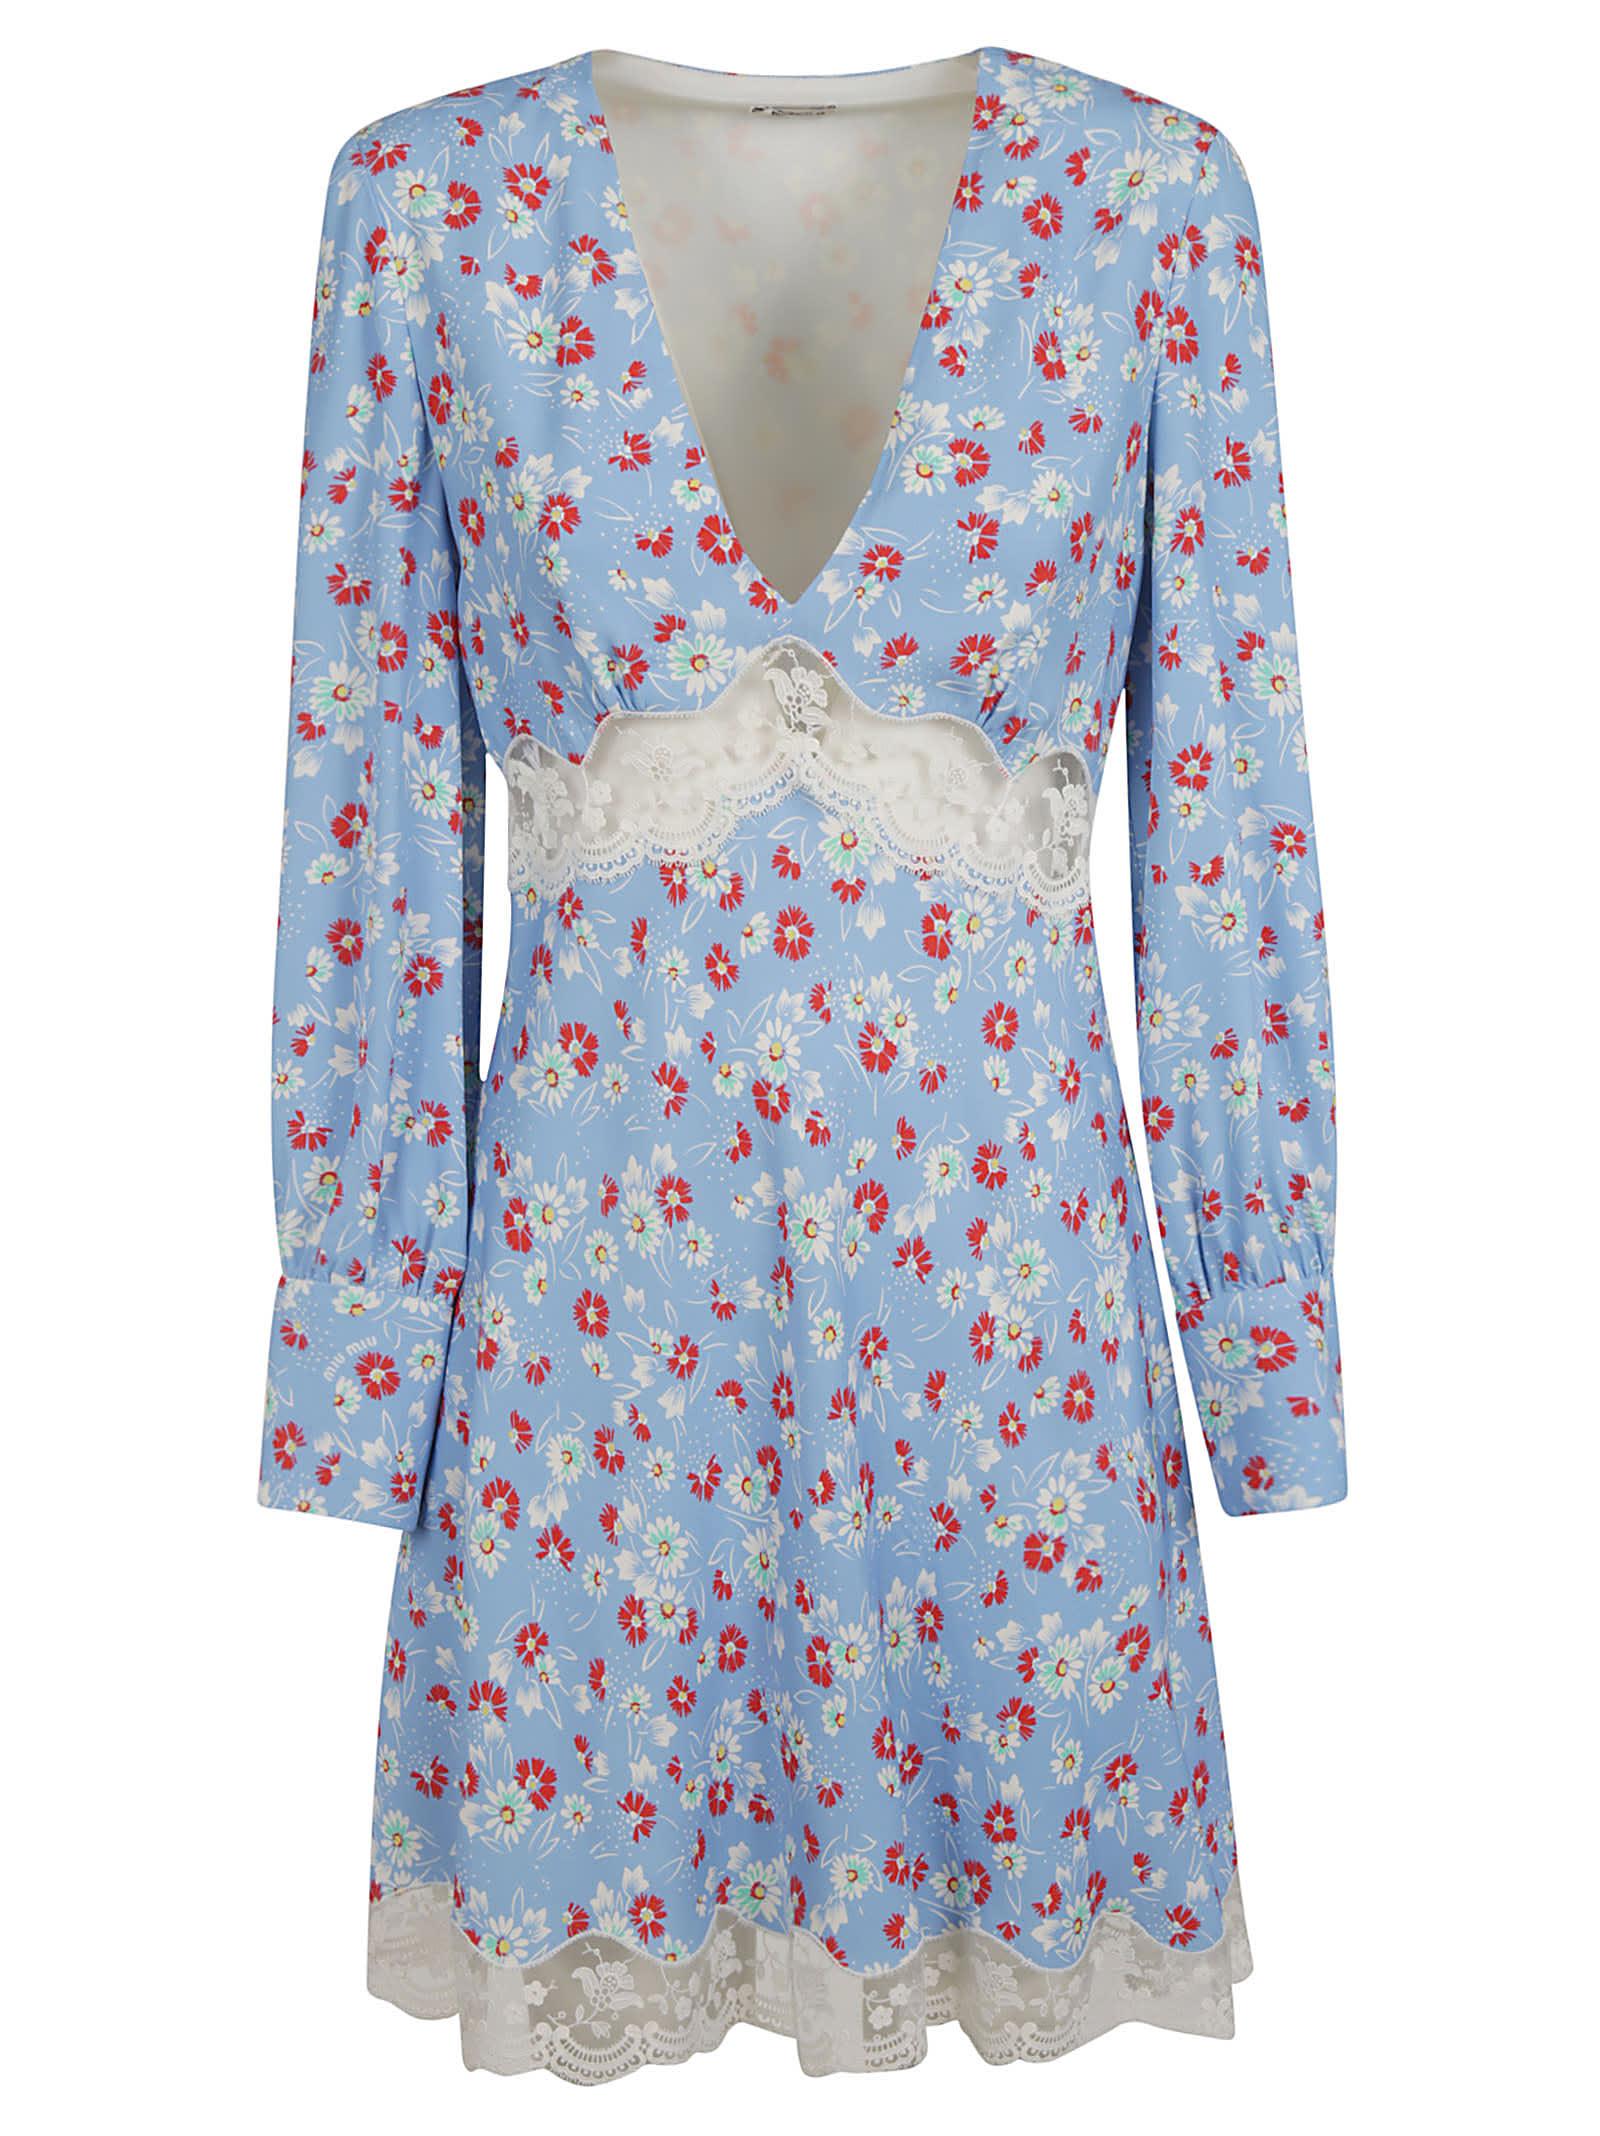 Buy Miu Miu Floral Print V-neck Laced Detail Dress online, shop Miu Miu with free shipping